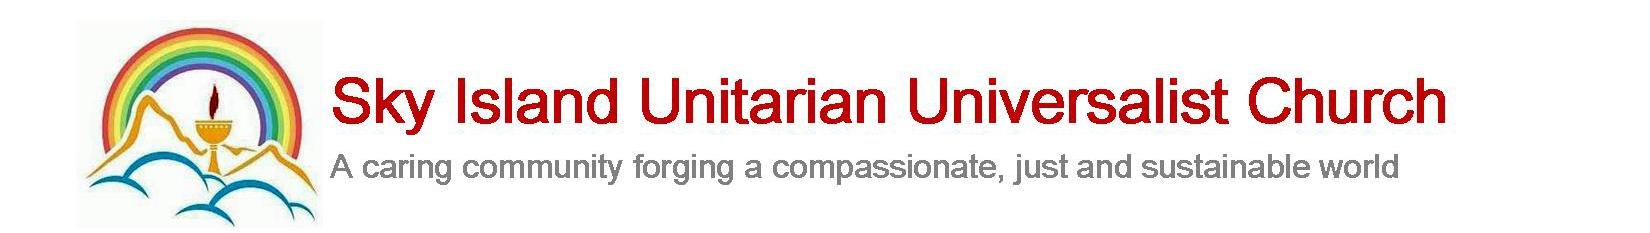 Sky Island Unitarian Universalist Church Logo